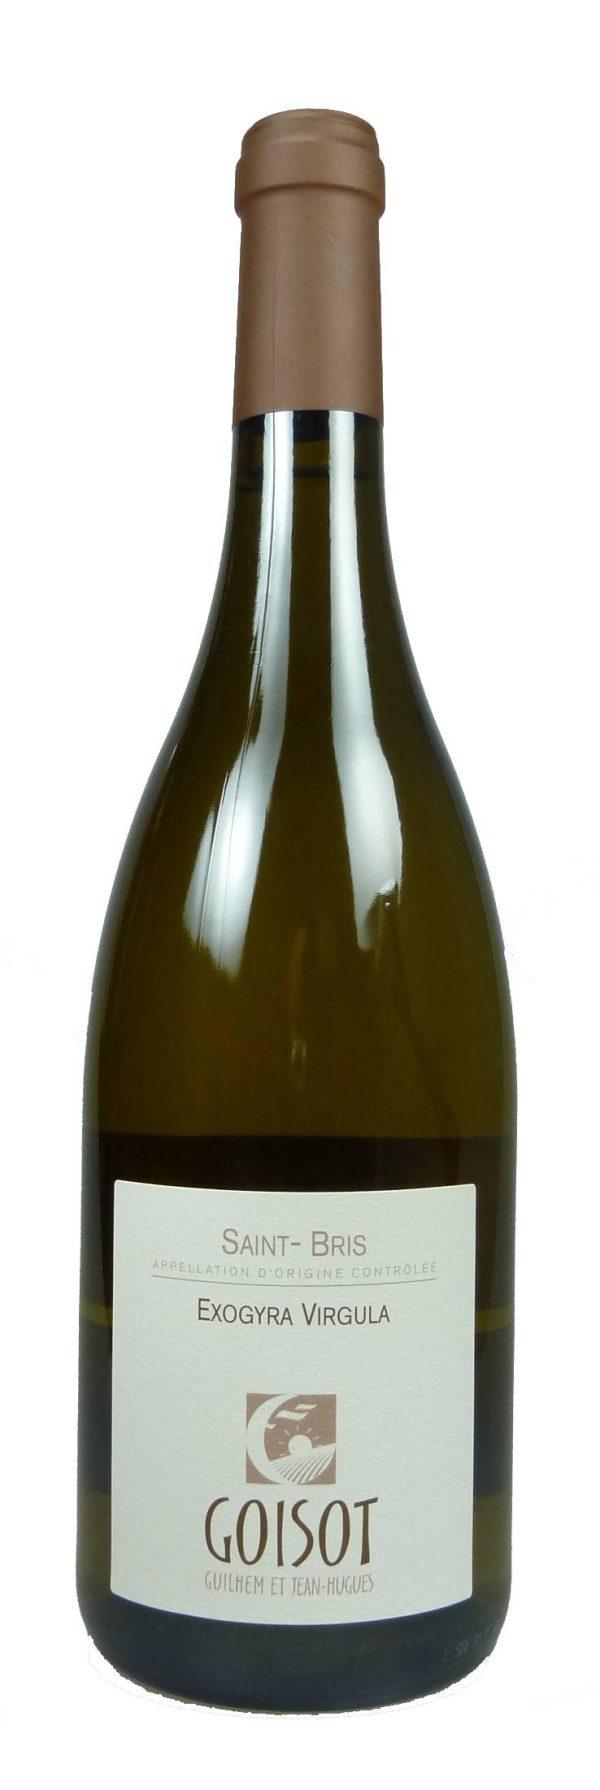 Exogyra Virgula Saint-Bris Sauvignon bio 2015